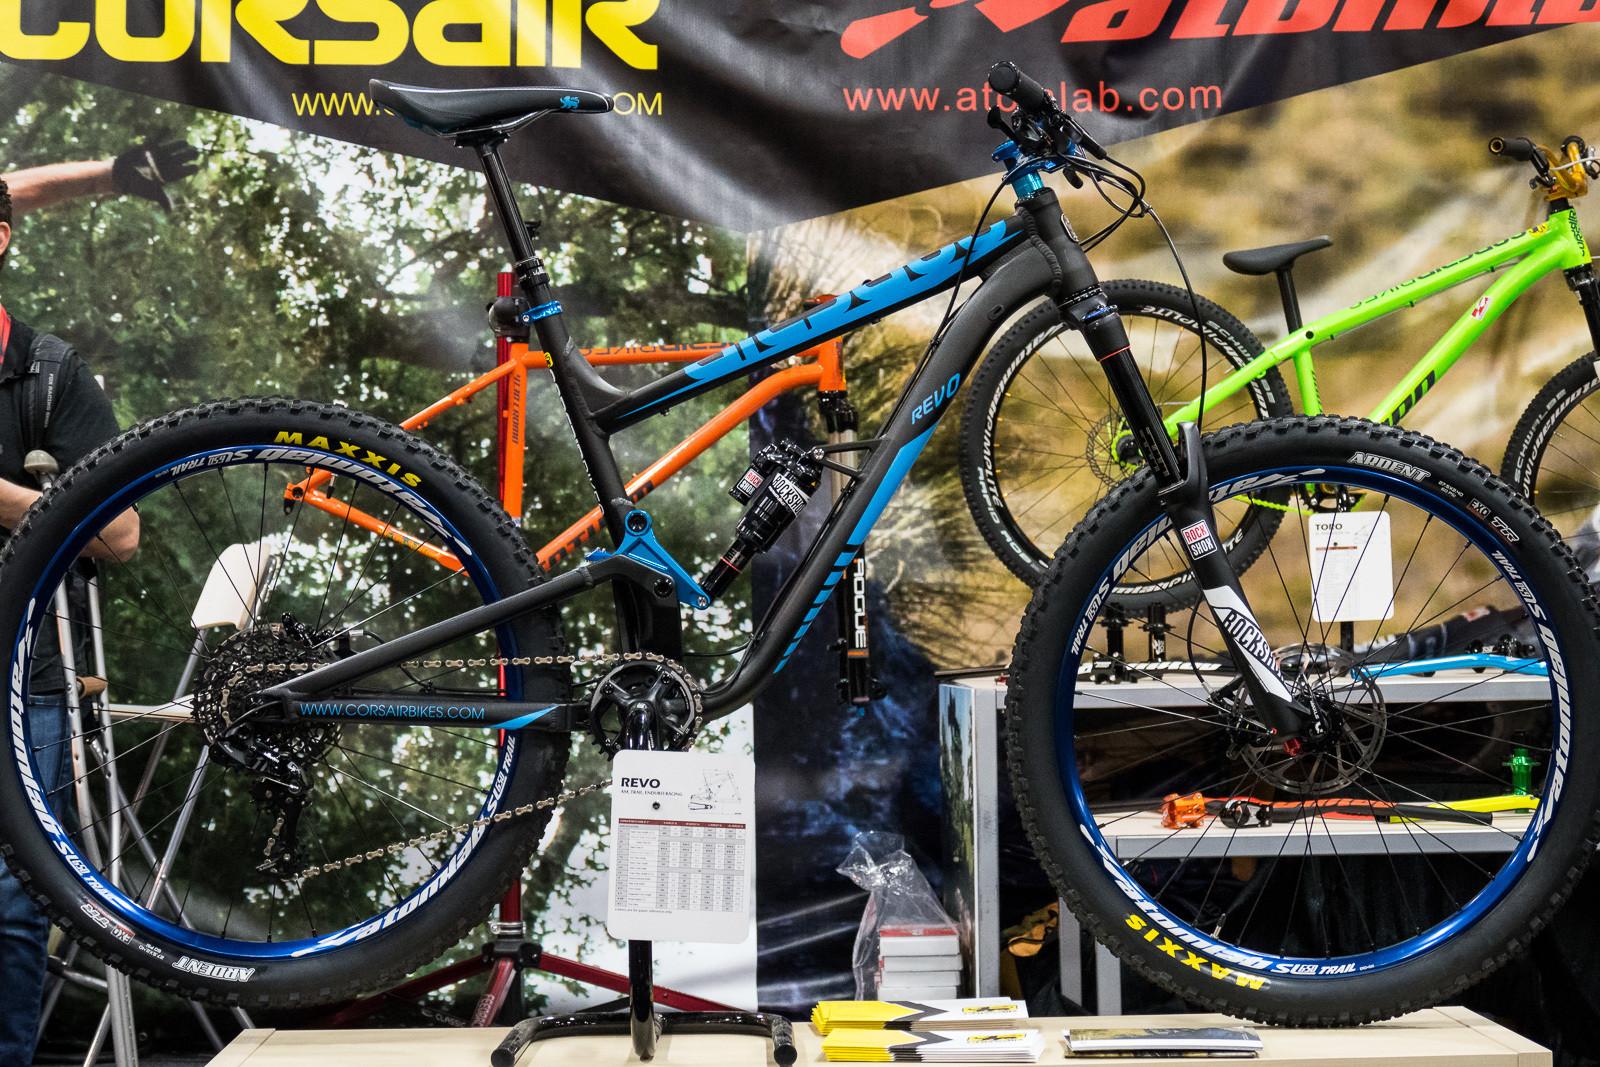 2016 Corsair Revo - 2016 Trail and Enduro Bikes at Interbike - Mountain Biking Pictures - Vital MTB